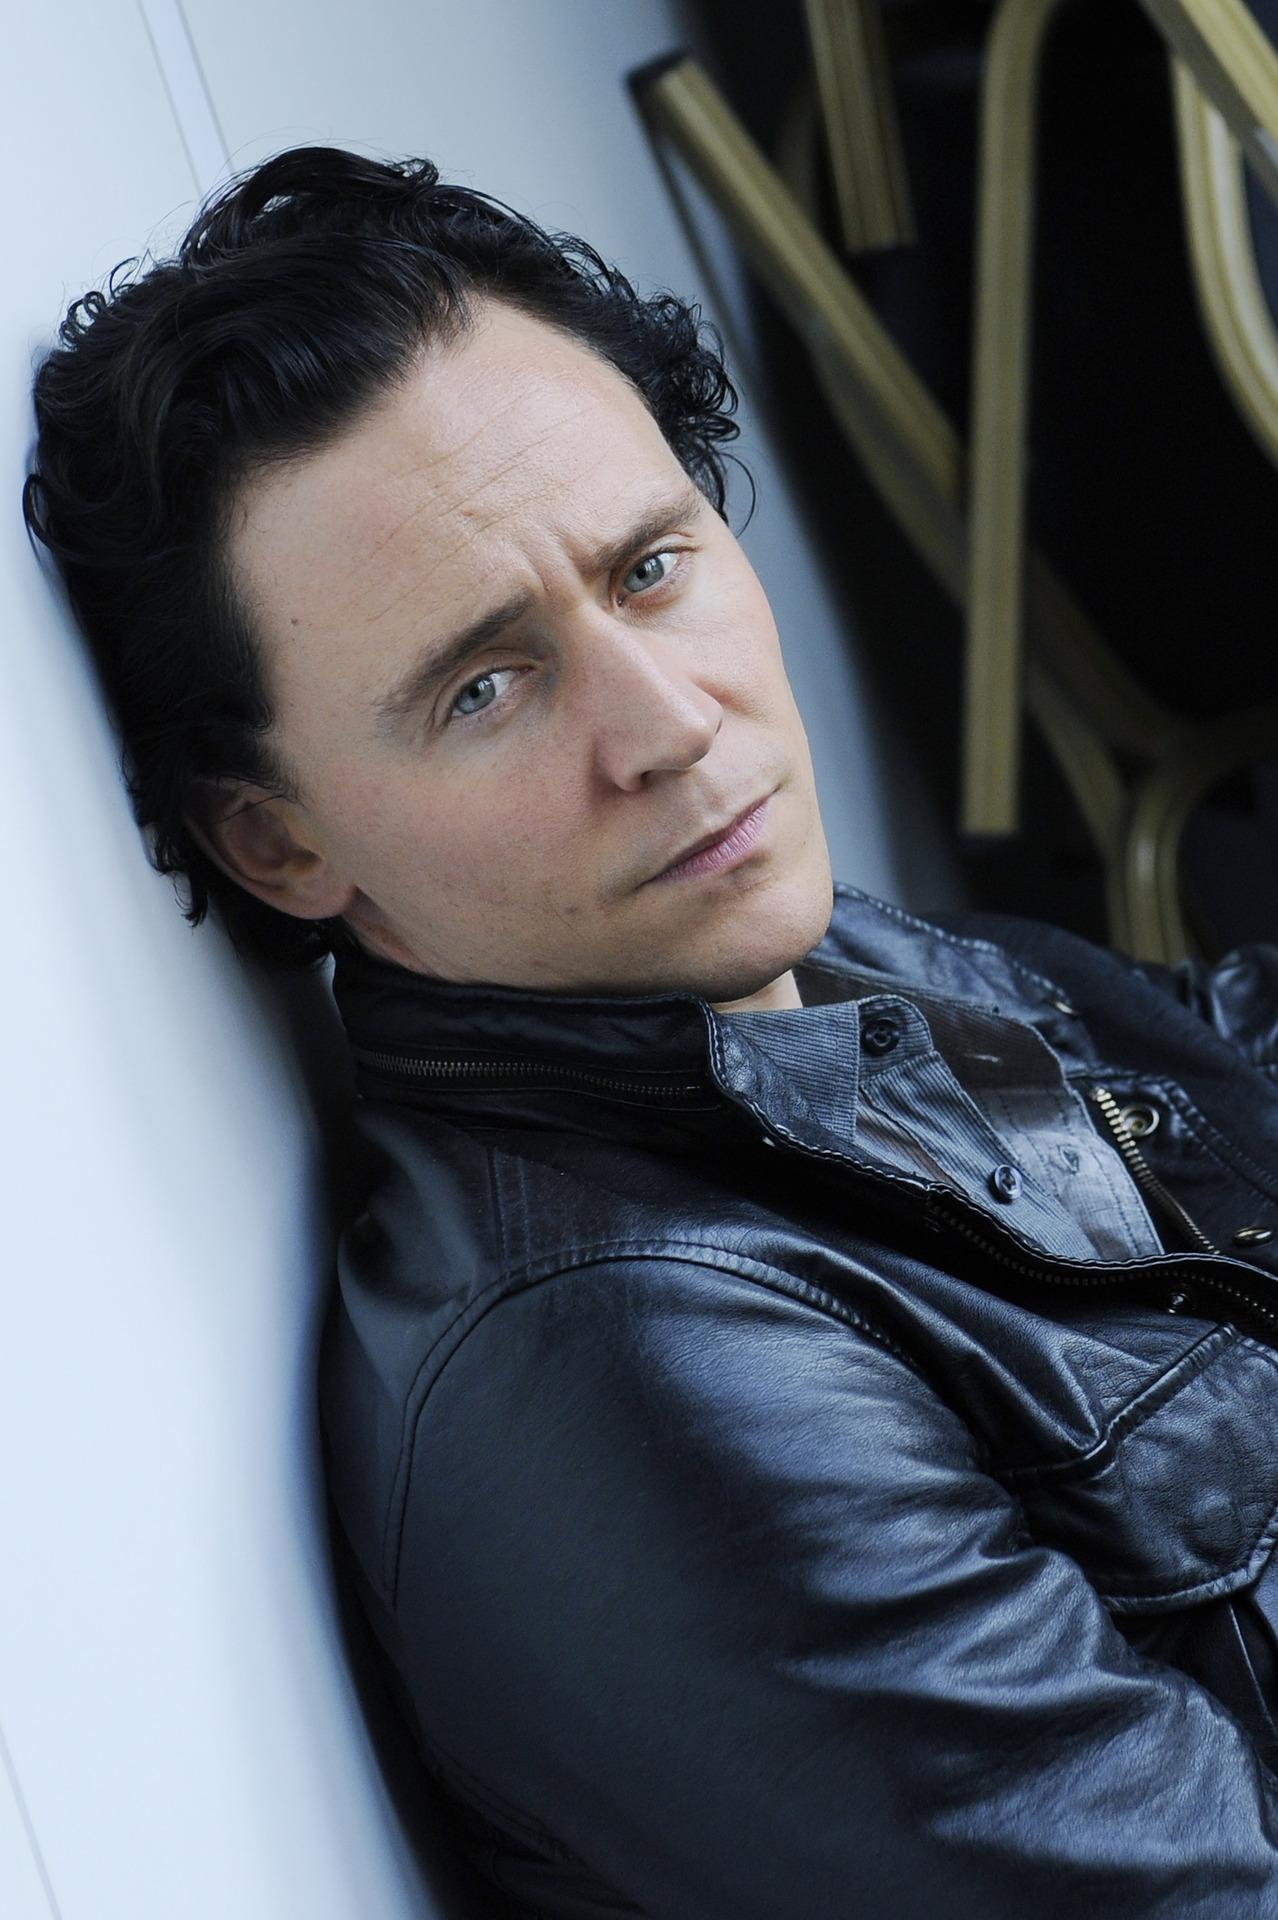 Acgbnwaj tom pinterest tom hiddleston toms and tom hiddleston